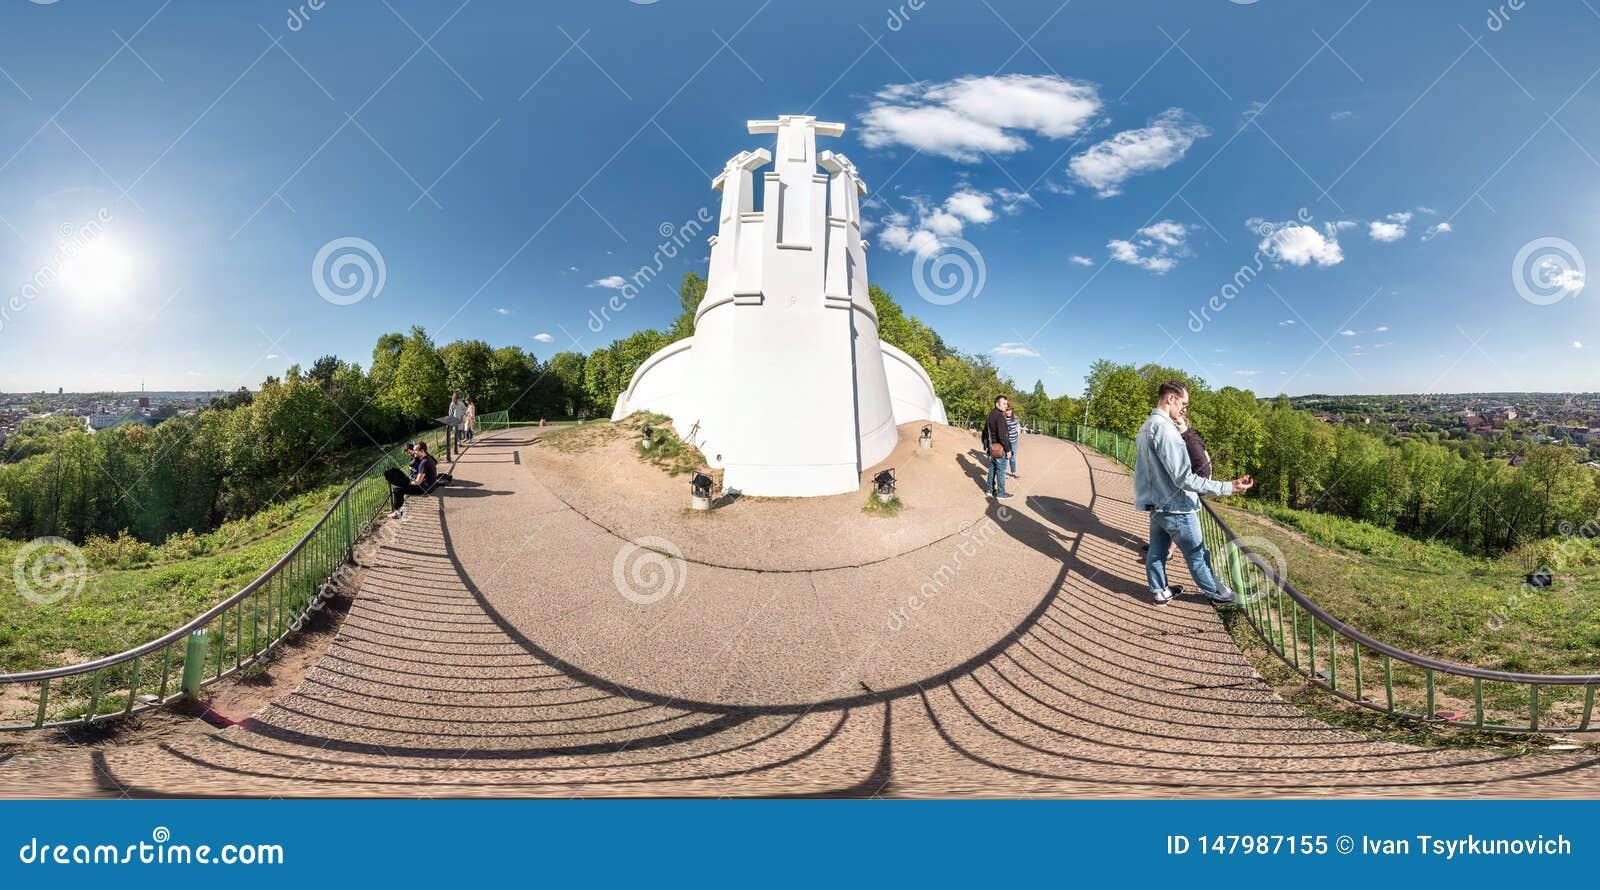 VILNIUS, ΛΙΘΟΥΑΝΙΑ - ΤΟ ΜΆΙΟ ΤΟΥ 2019: Πλήρες σφαιρικό άνευ ραφής πανόραμα 360 βαθμοί άποψης γωνίας από το μνημείο τριών σταυρών